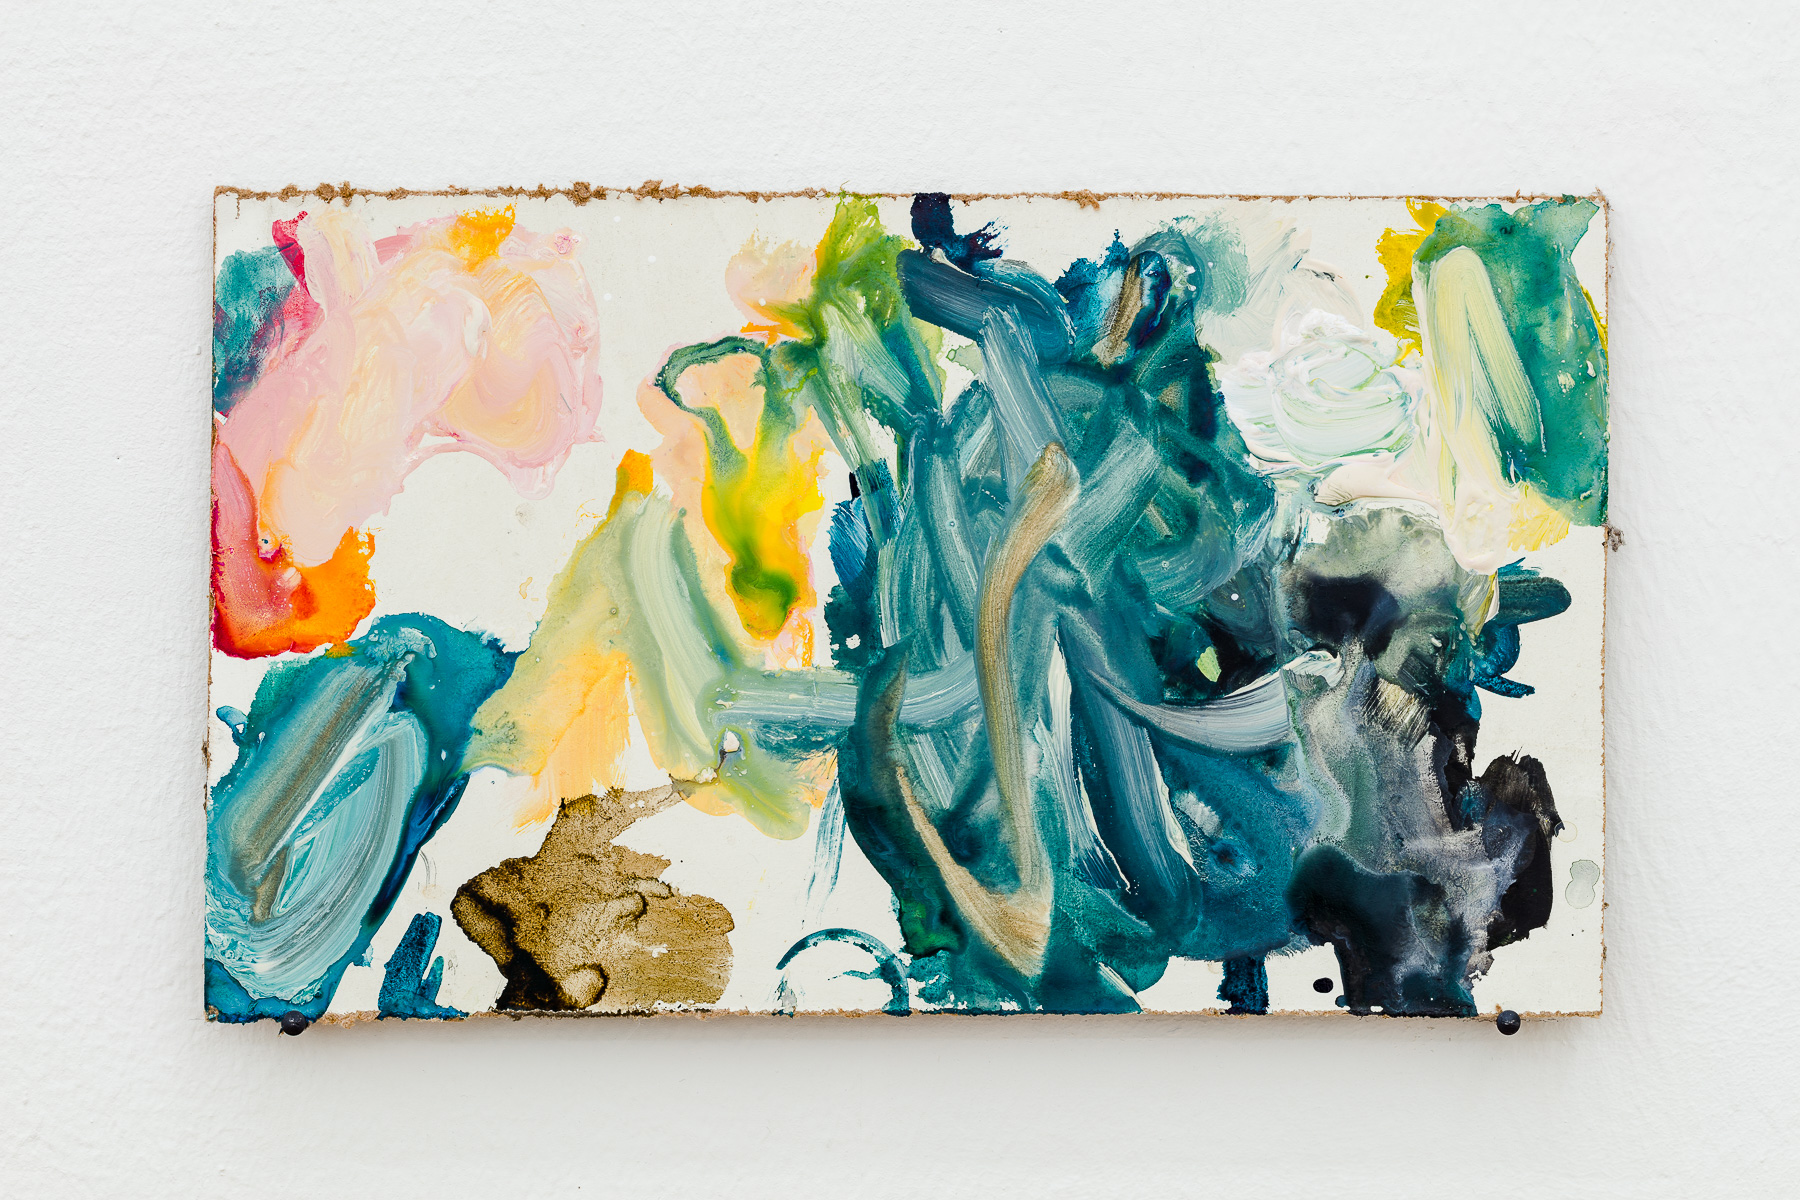 2019_05_20_Elke-Krystufek_Croy-Nielsen_by-kunst-dokumentation-com_003_web.jpg